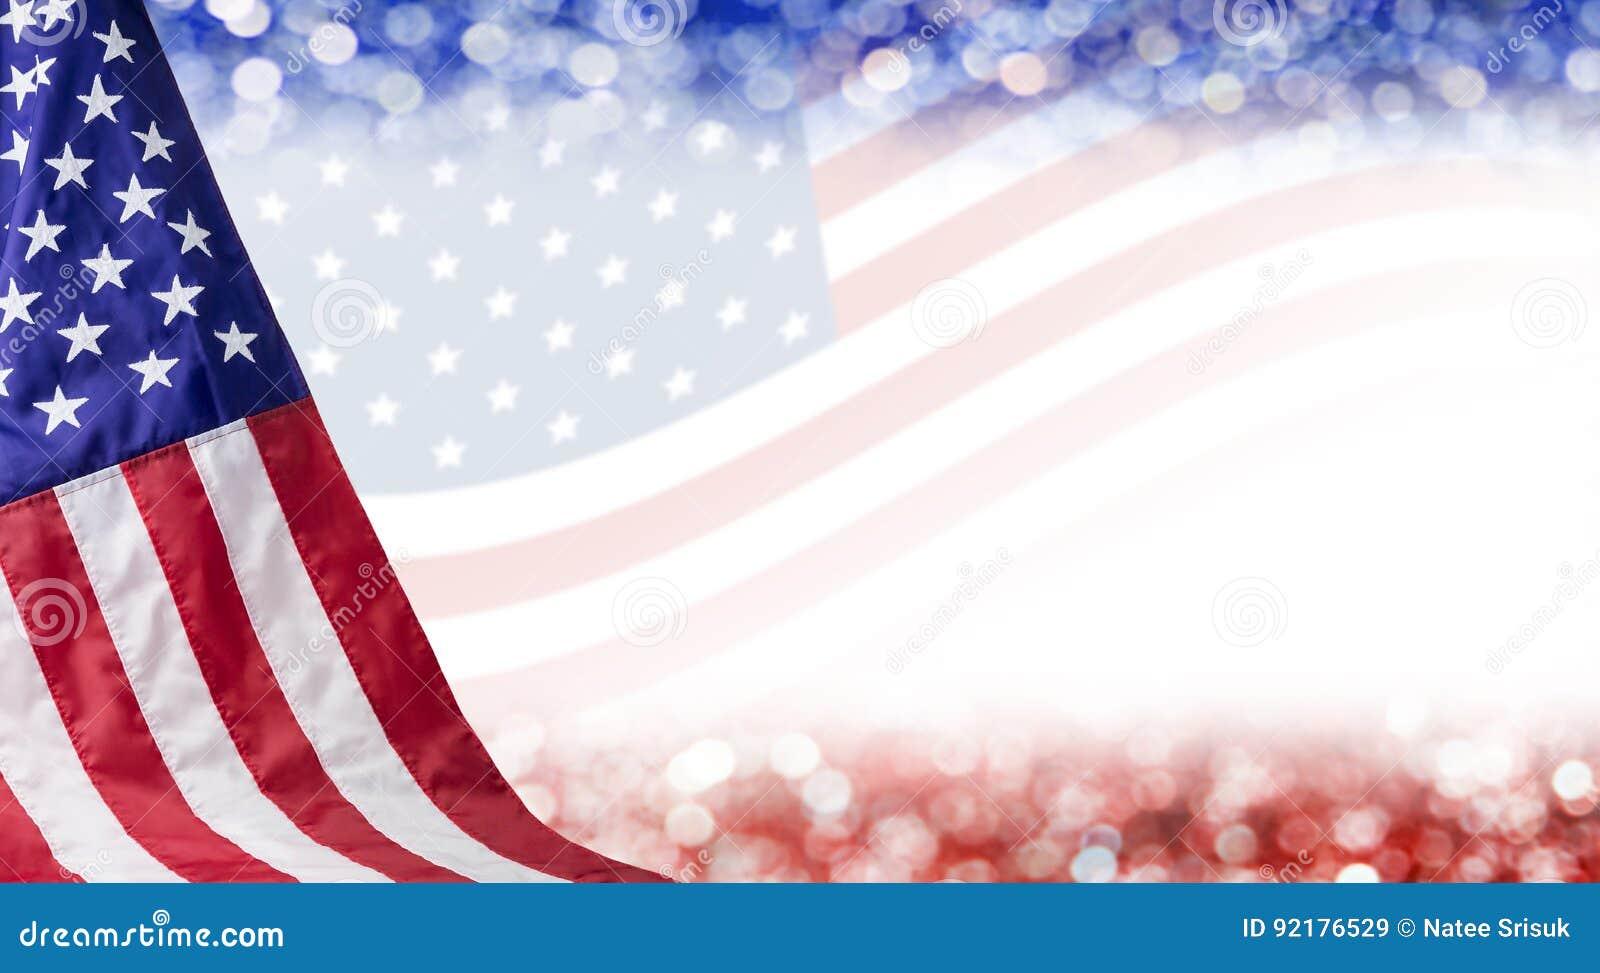 Предпосылка американского флага и bokeh